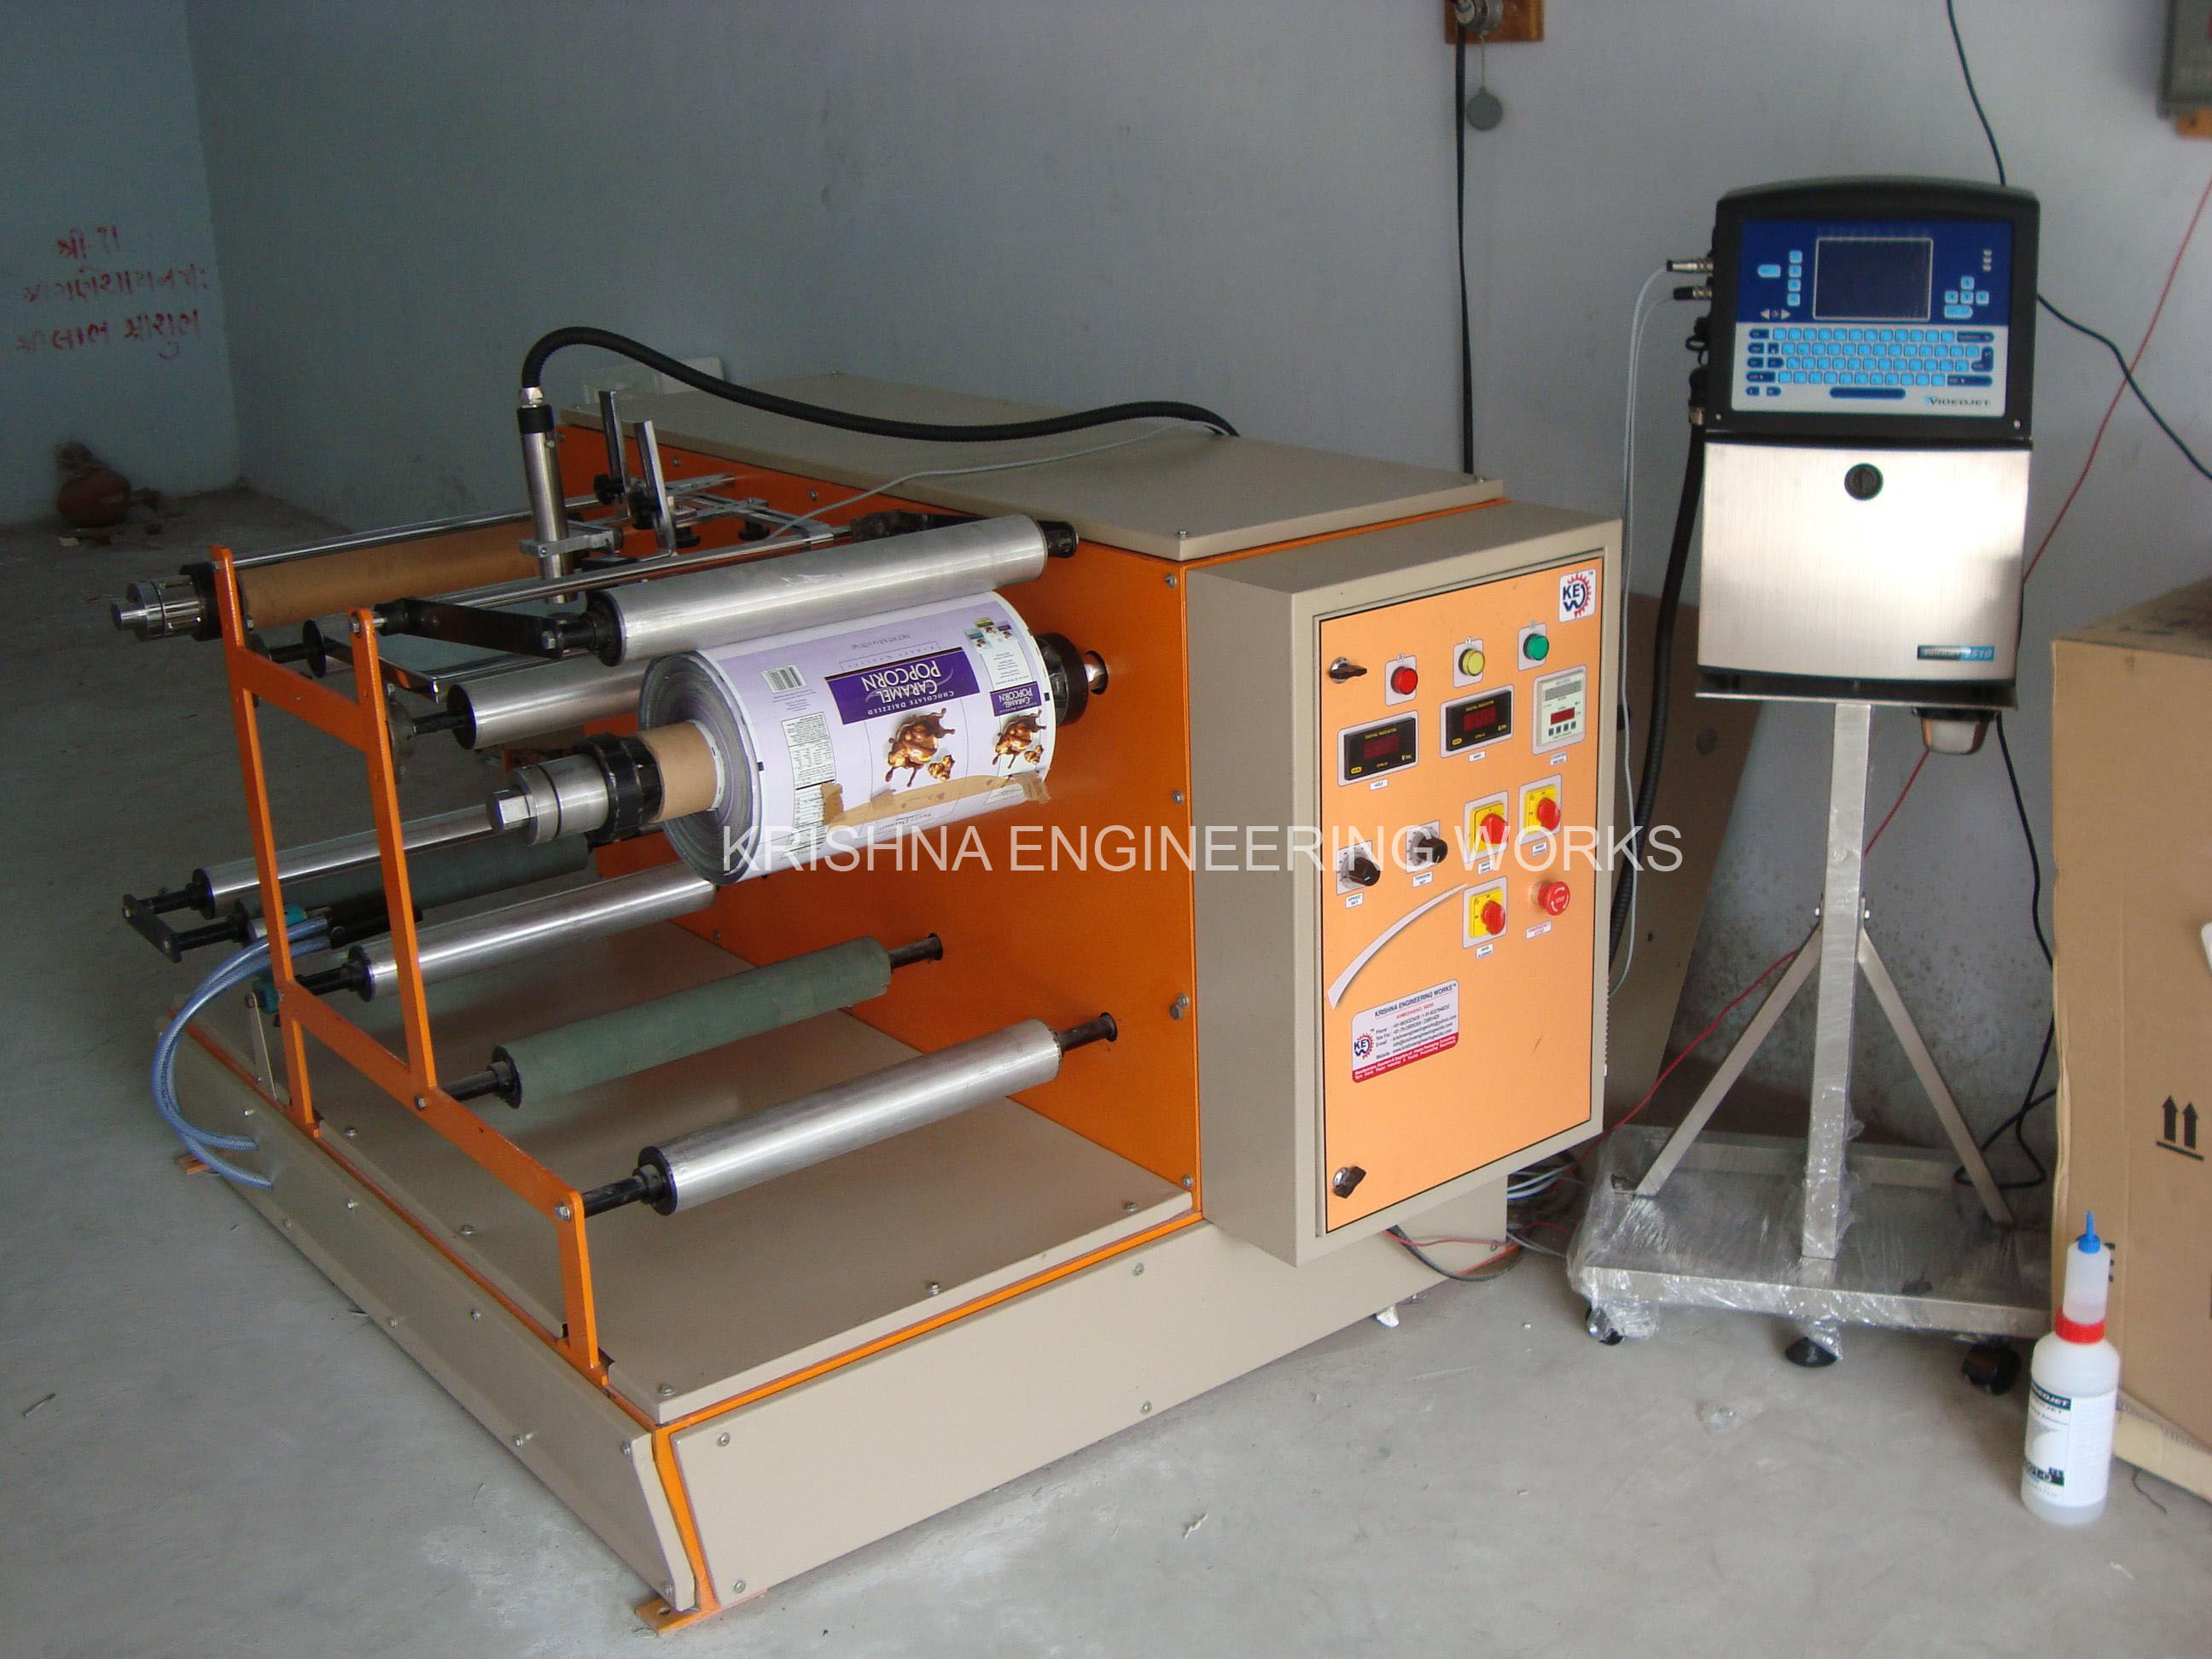 "<a href=""http://www.krishnaengineeringworks.co.za/winding-rewinding-machine/"">Winding Rewinding Machine</a>"